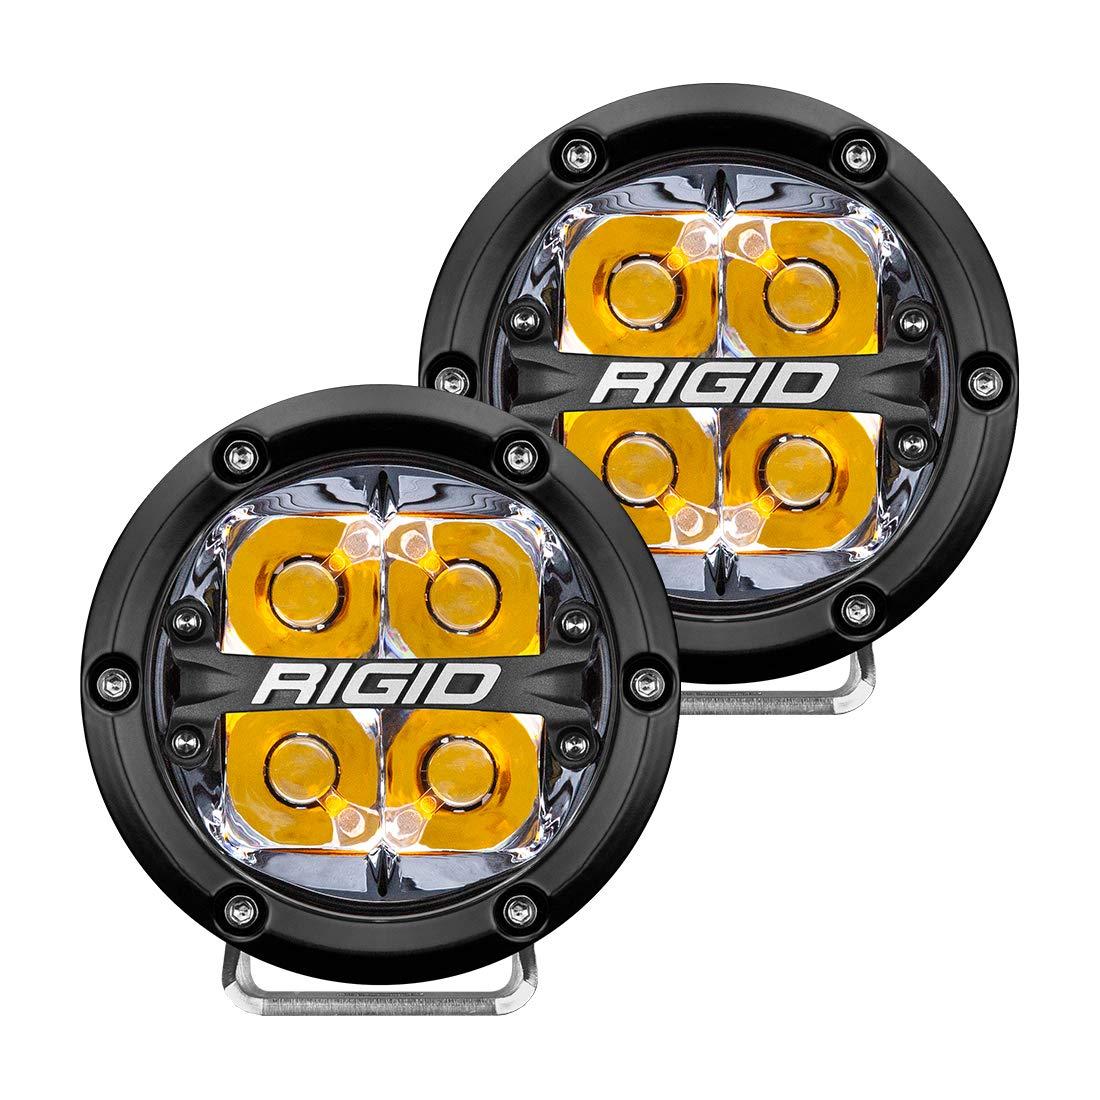 RIGID 360-SERIES 4 INCH LED OFF-ROAD SPOT BEAM AMB BACKLIGHT PAIR